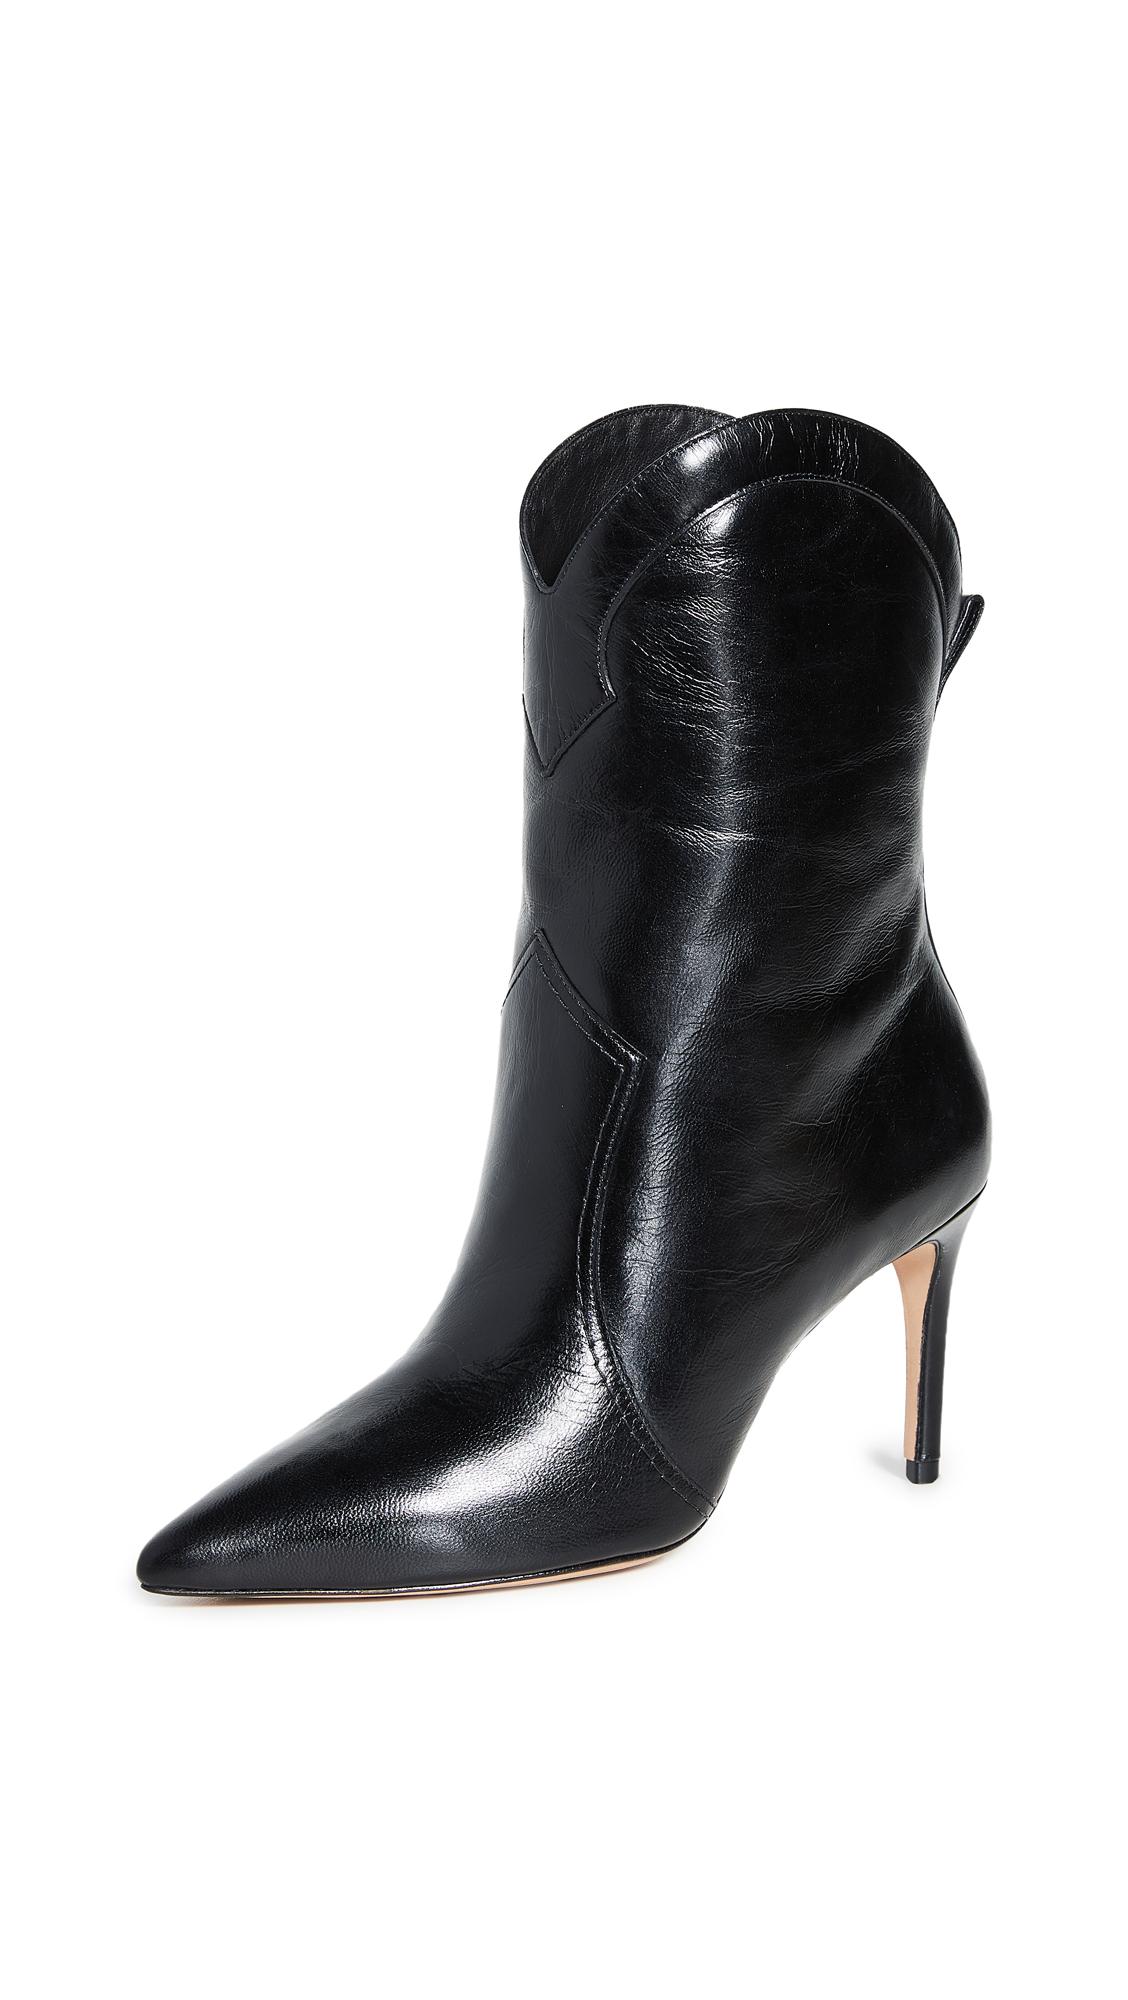 Alexandre Birman Esther 85 Boots - Black